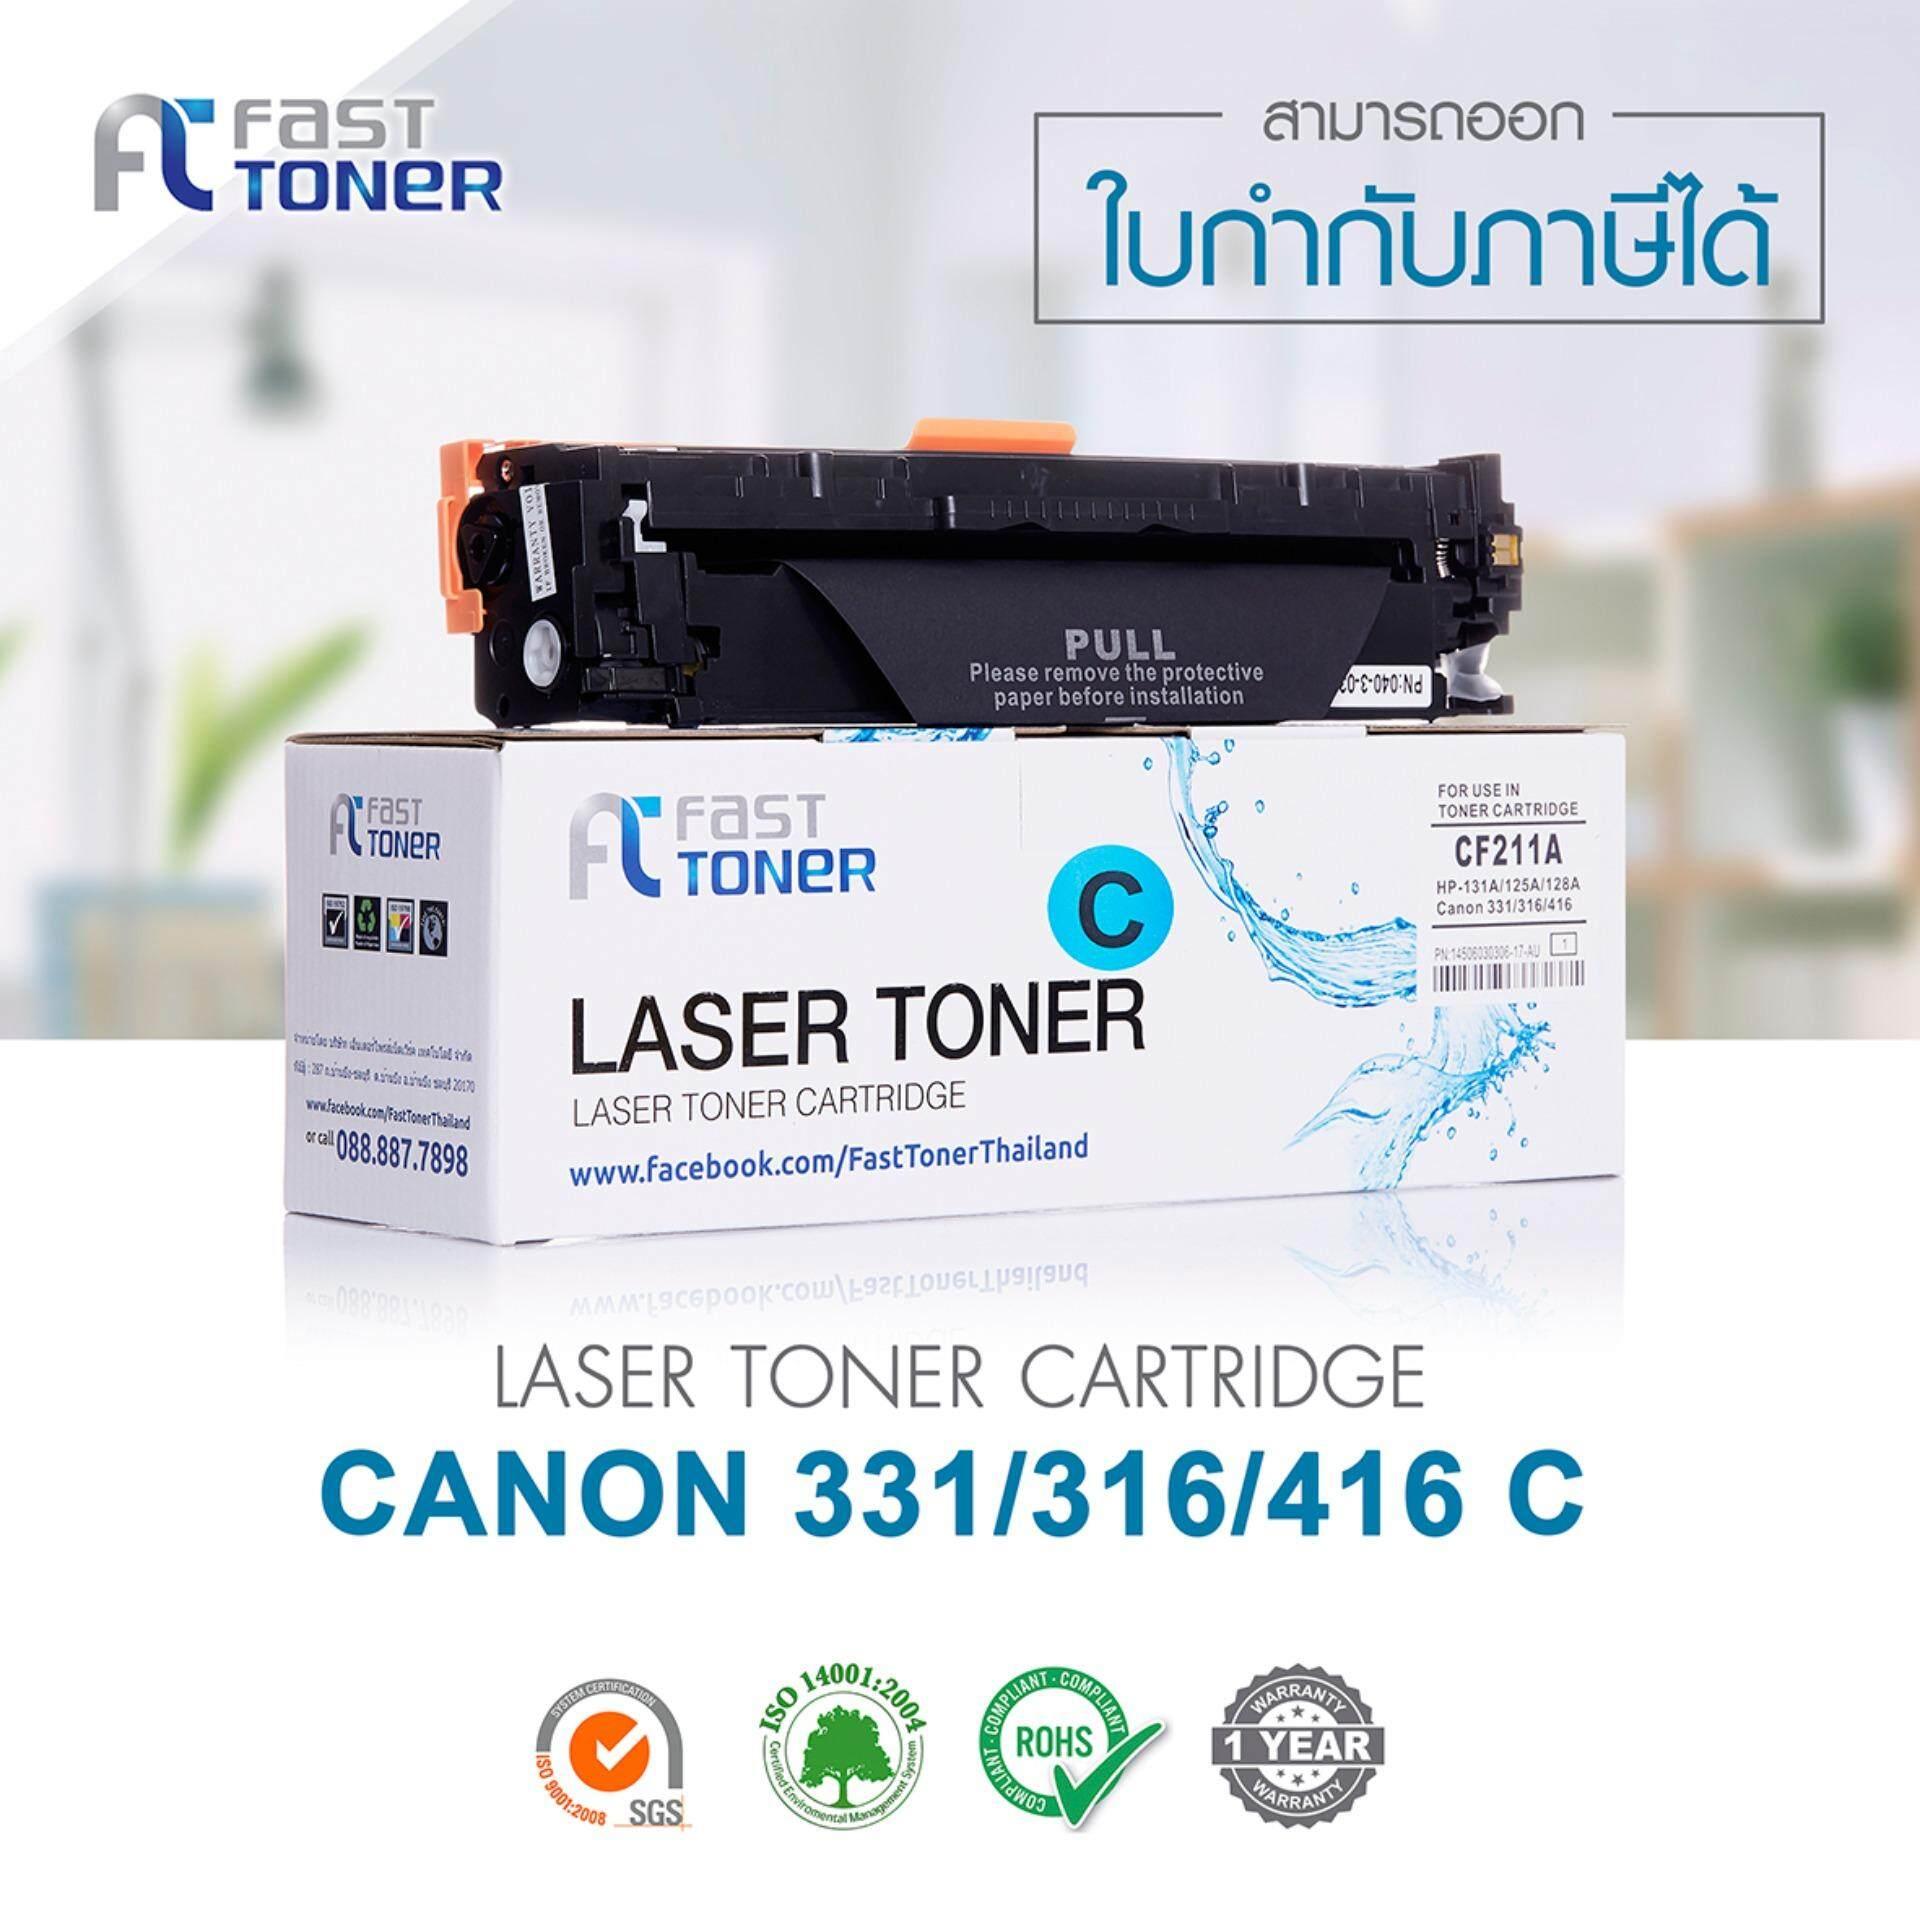 Fast Toner ตลับหมึกเทียบเท่า CANON Cartridge-331/316/416 (ฟ้า) สำหรับปริ้นเตอร์รุ่น  Canon Laser Shot LBP 7100/7110 Canon i-Sensys MF 8230/MF 8280